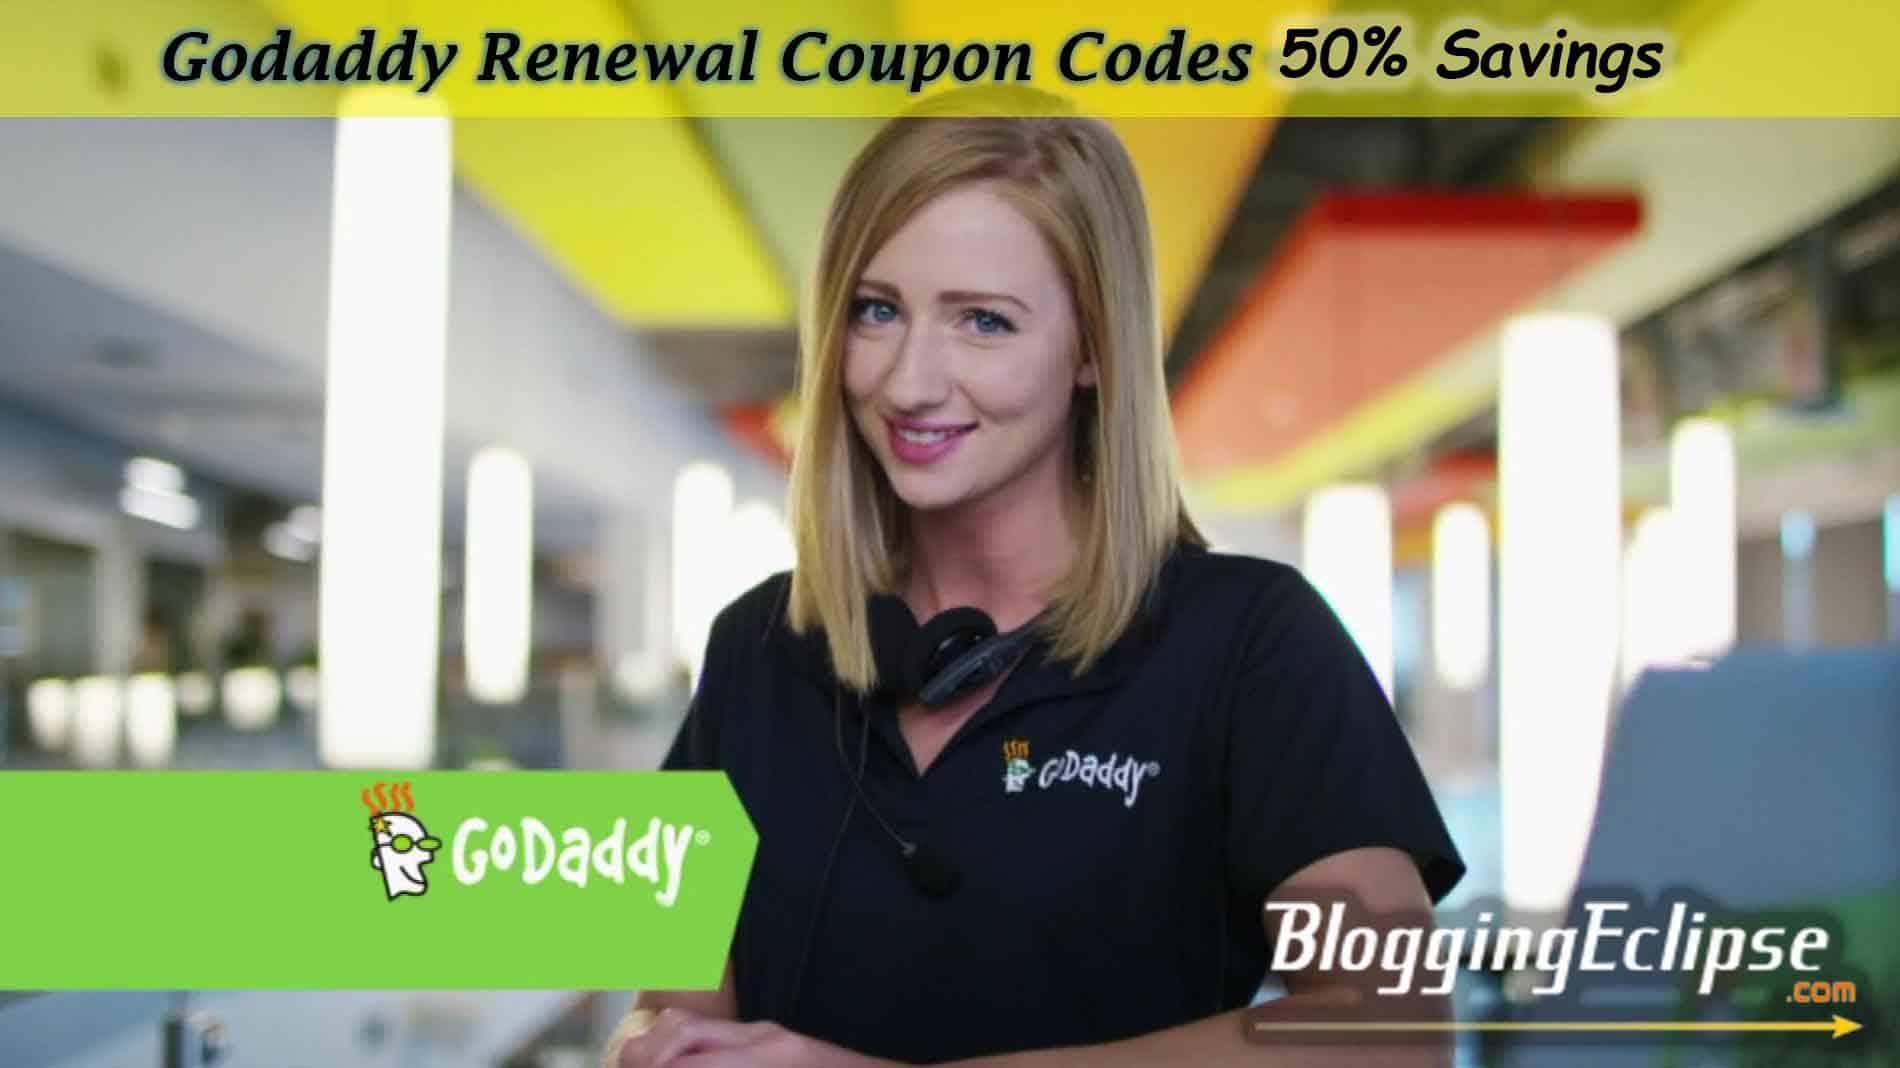 Godaddy-renewal-Coupons